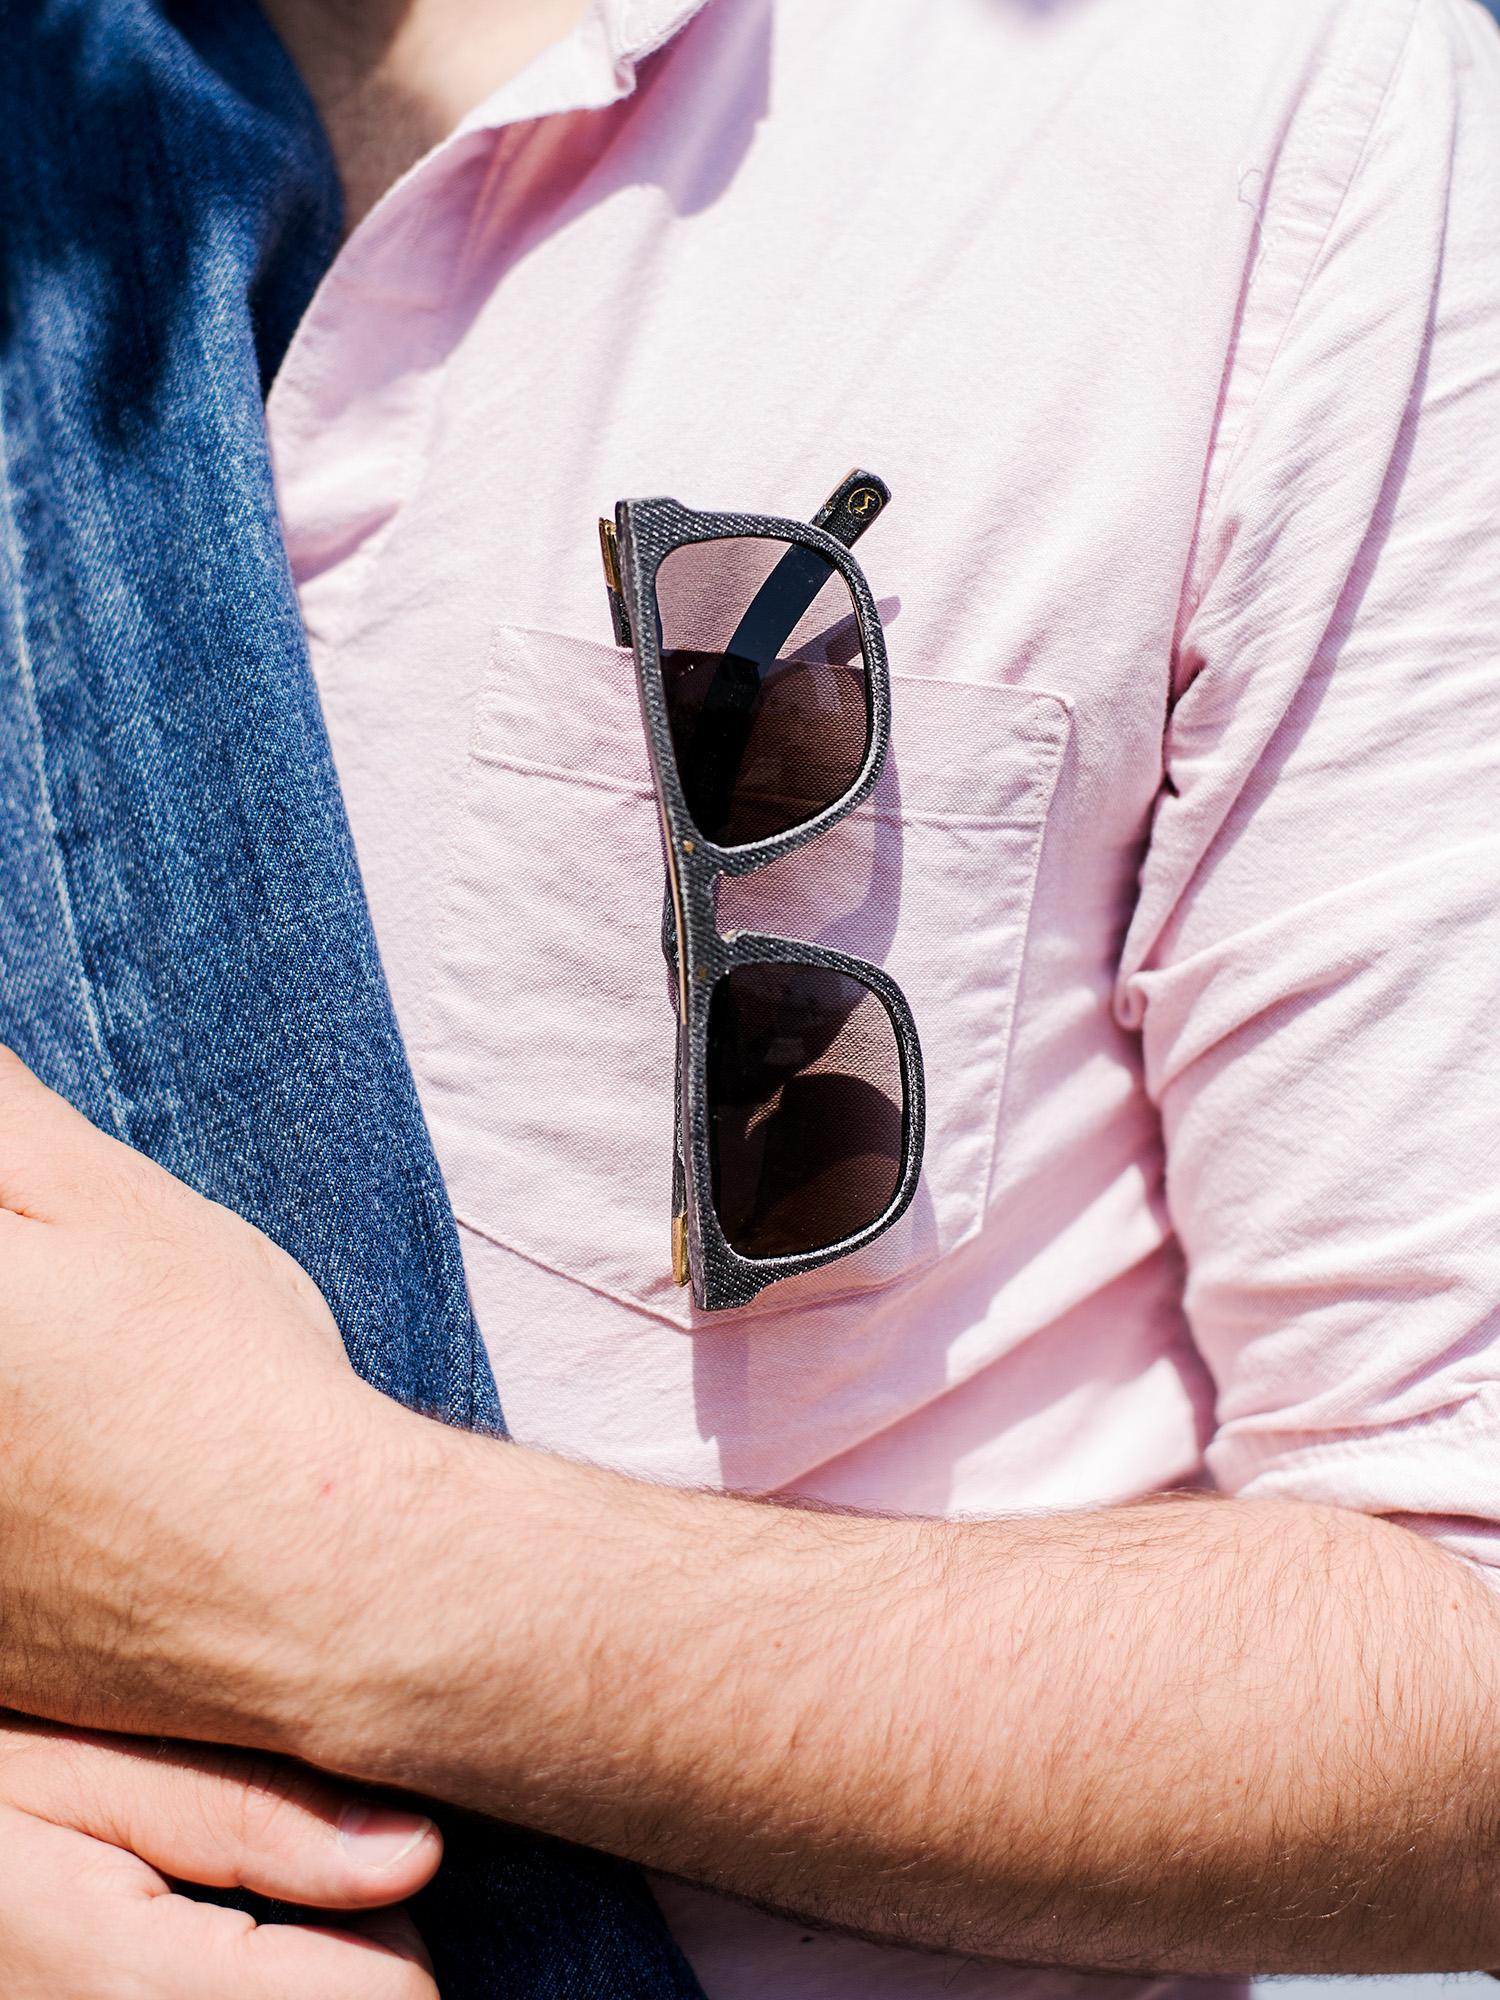 Work for  Mosevic  sunglasses. Glasses handmade from 100% recycled denim.  Titan  in black.